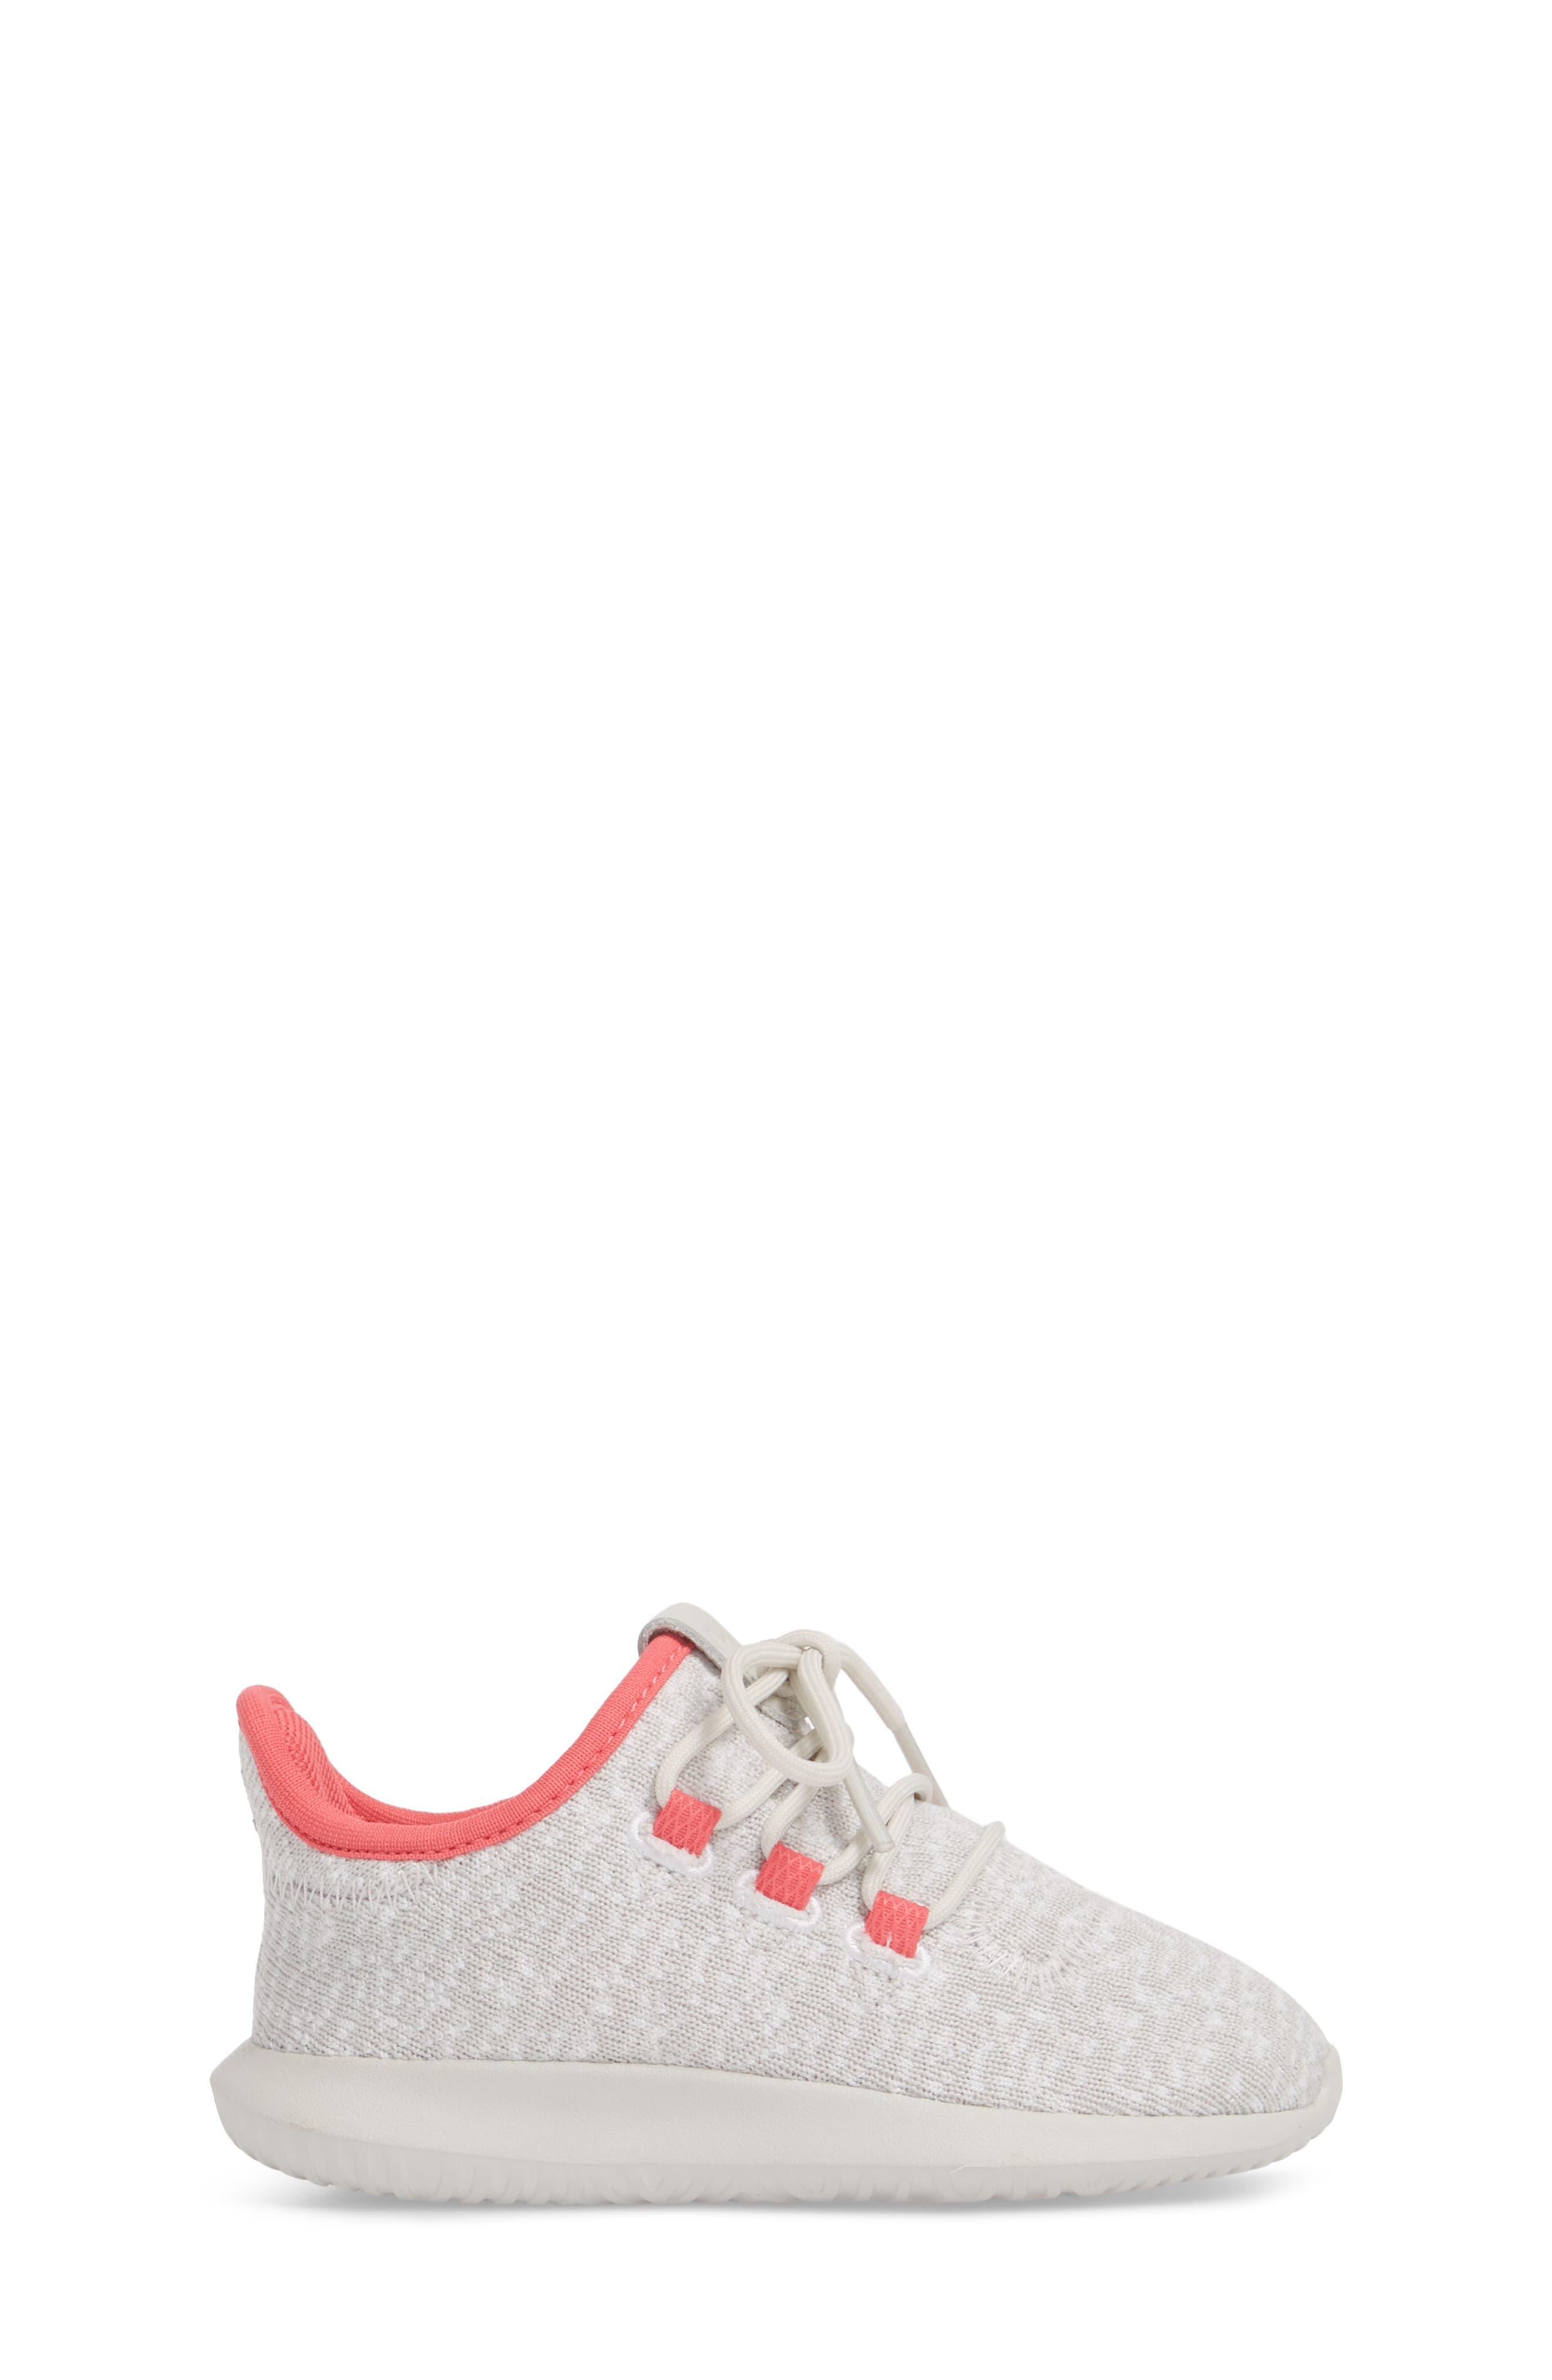 Tubular Shadow Sneaker,                             Alternate thumbnail 3, color,                             Grey/ Ash Pink/ White